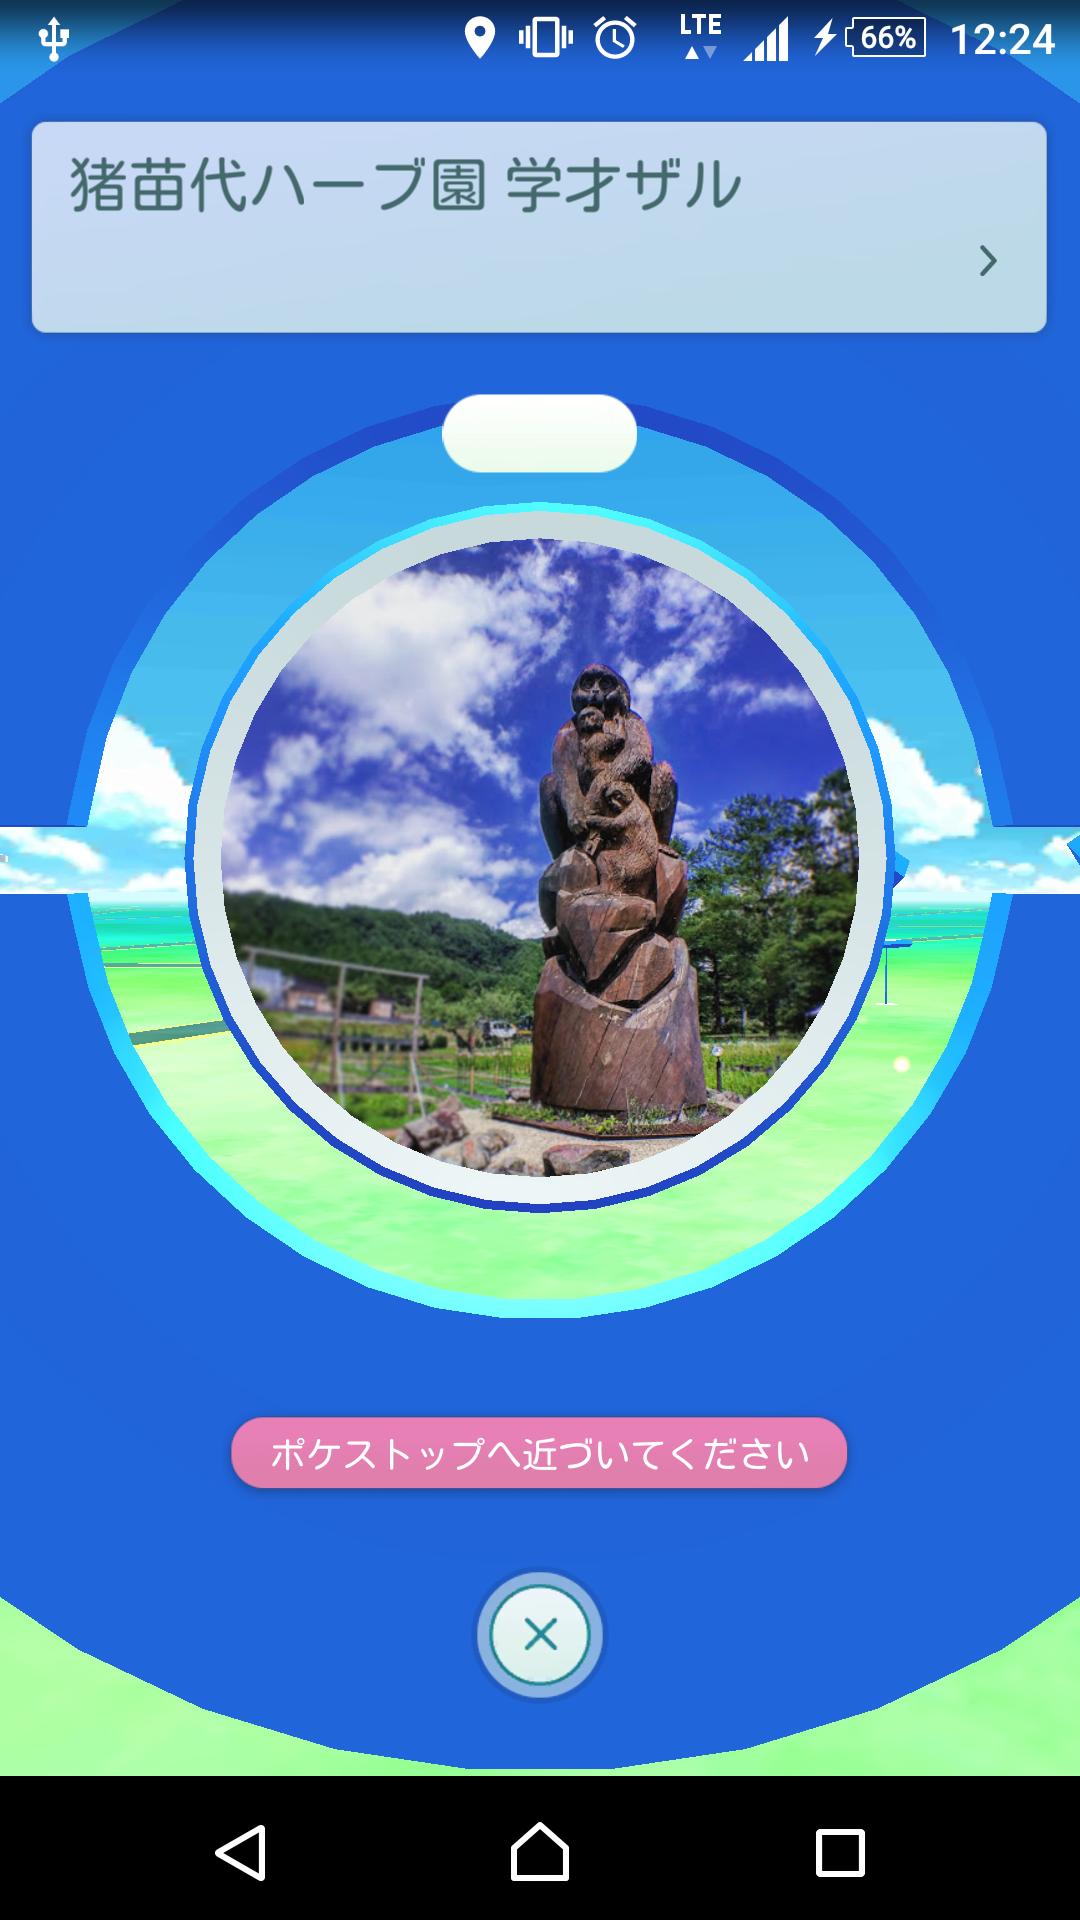 http://www.listel-inawashiro.jp/blog/Screenshot_2016-07-28-12-24-56%5B1%5D.png